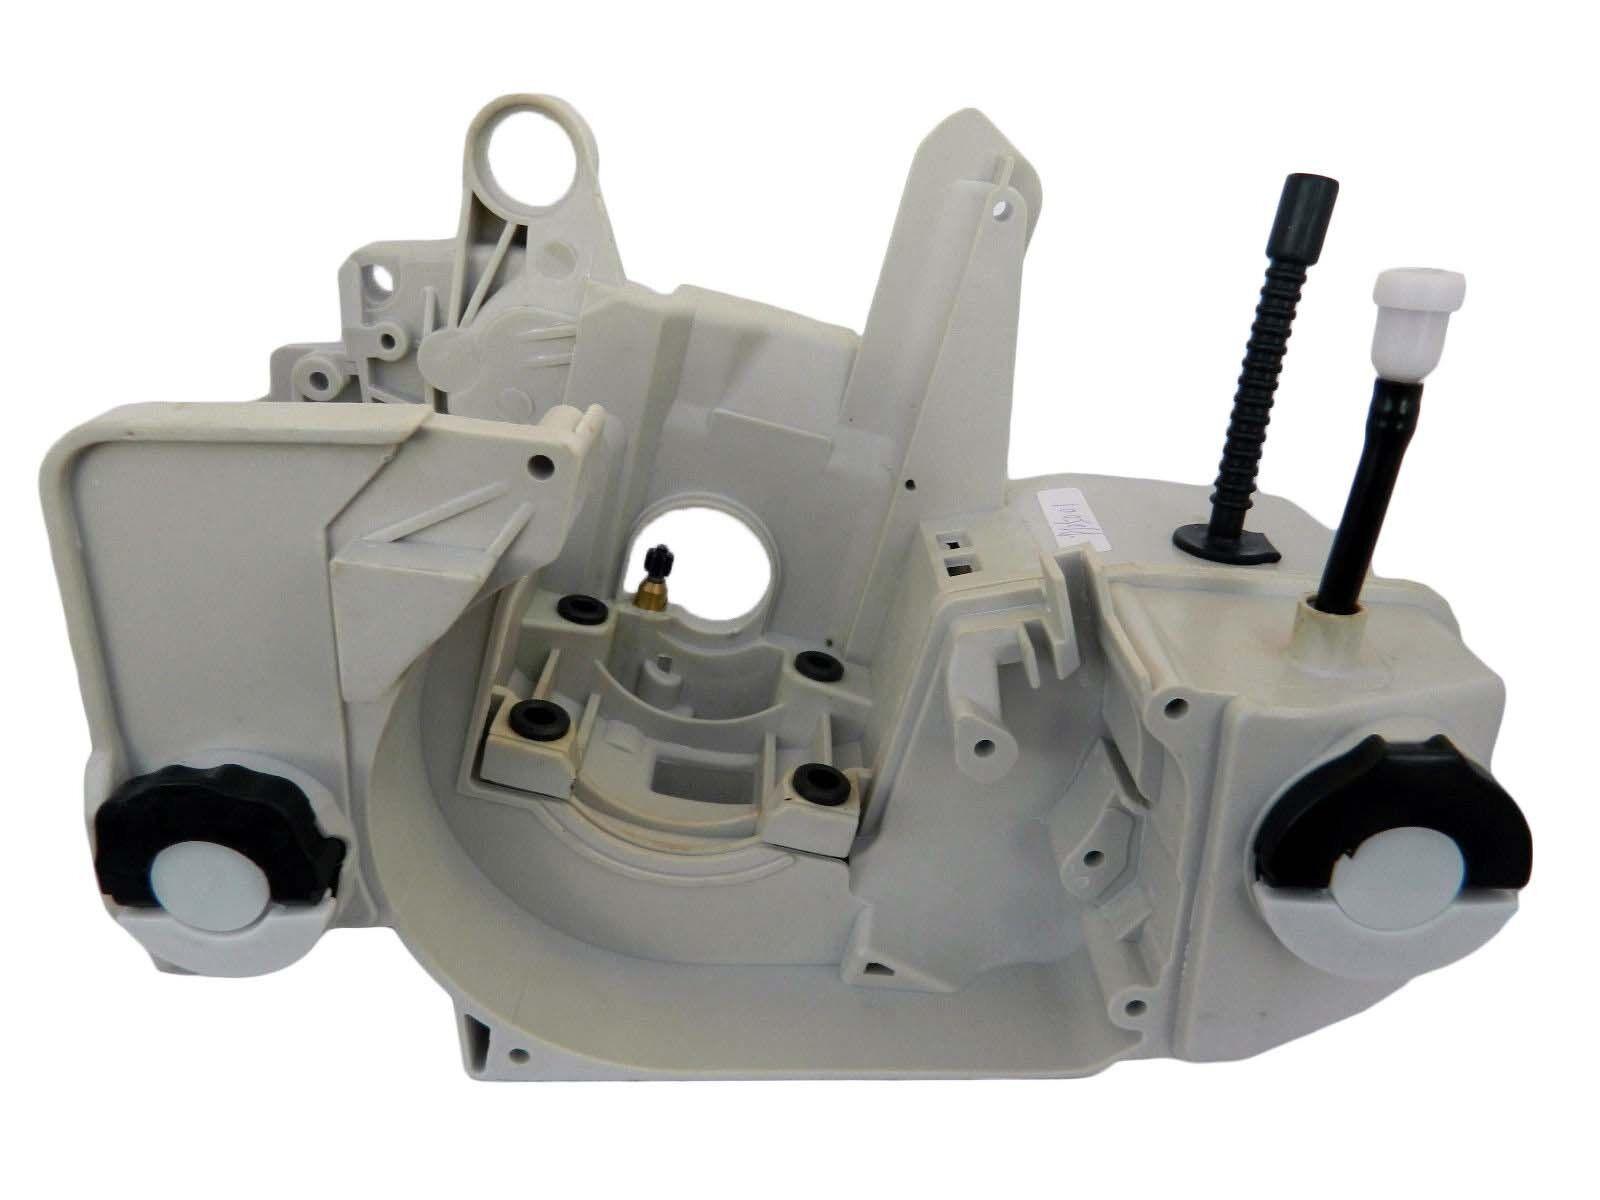 Compatible con Stihl MS210 MS230 MS250 021 023 025 Motor Cuna con aceite Tapa de combustible